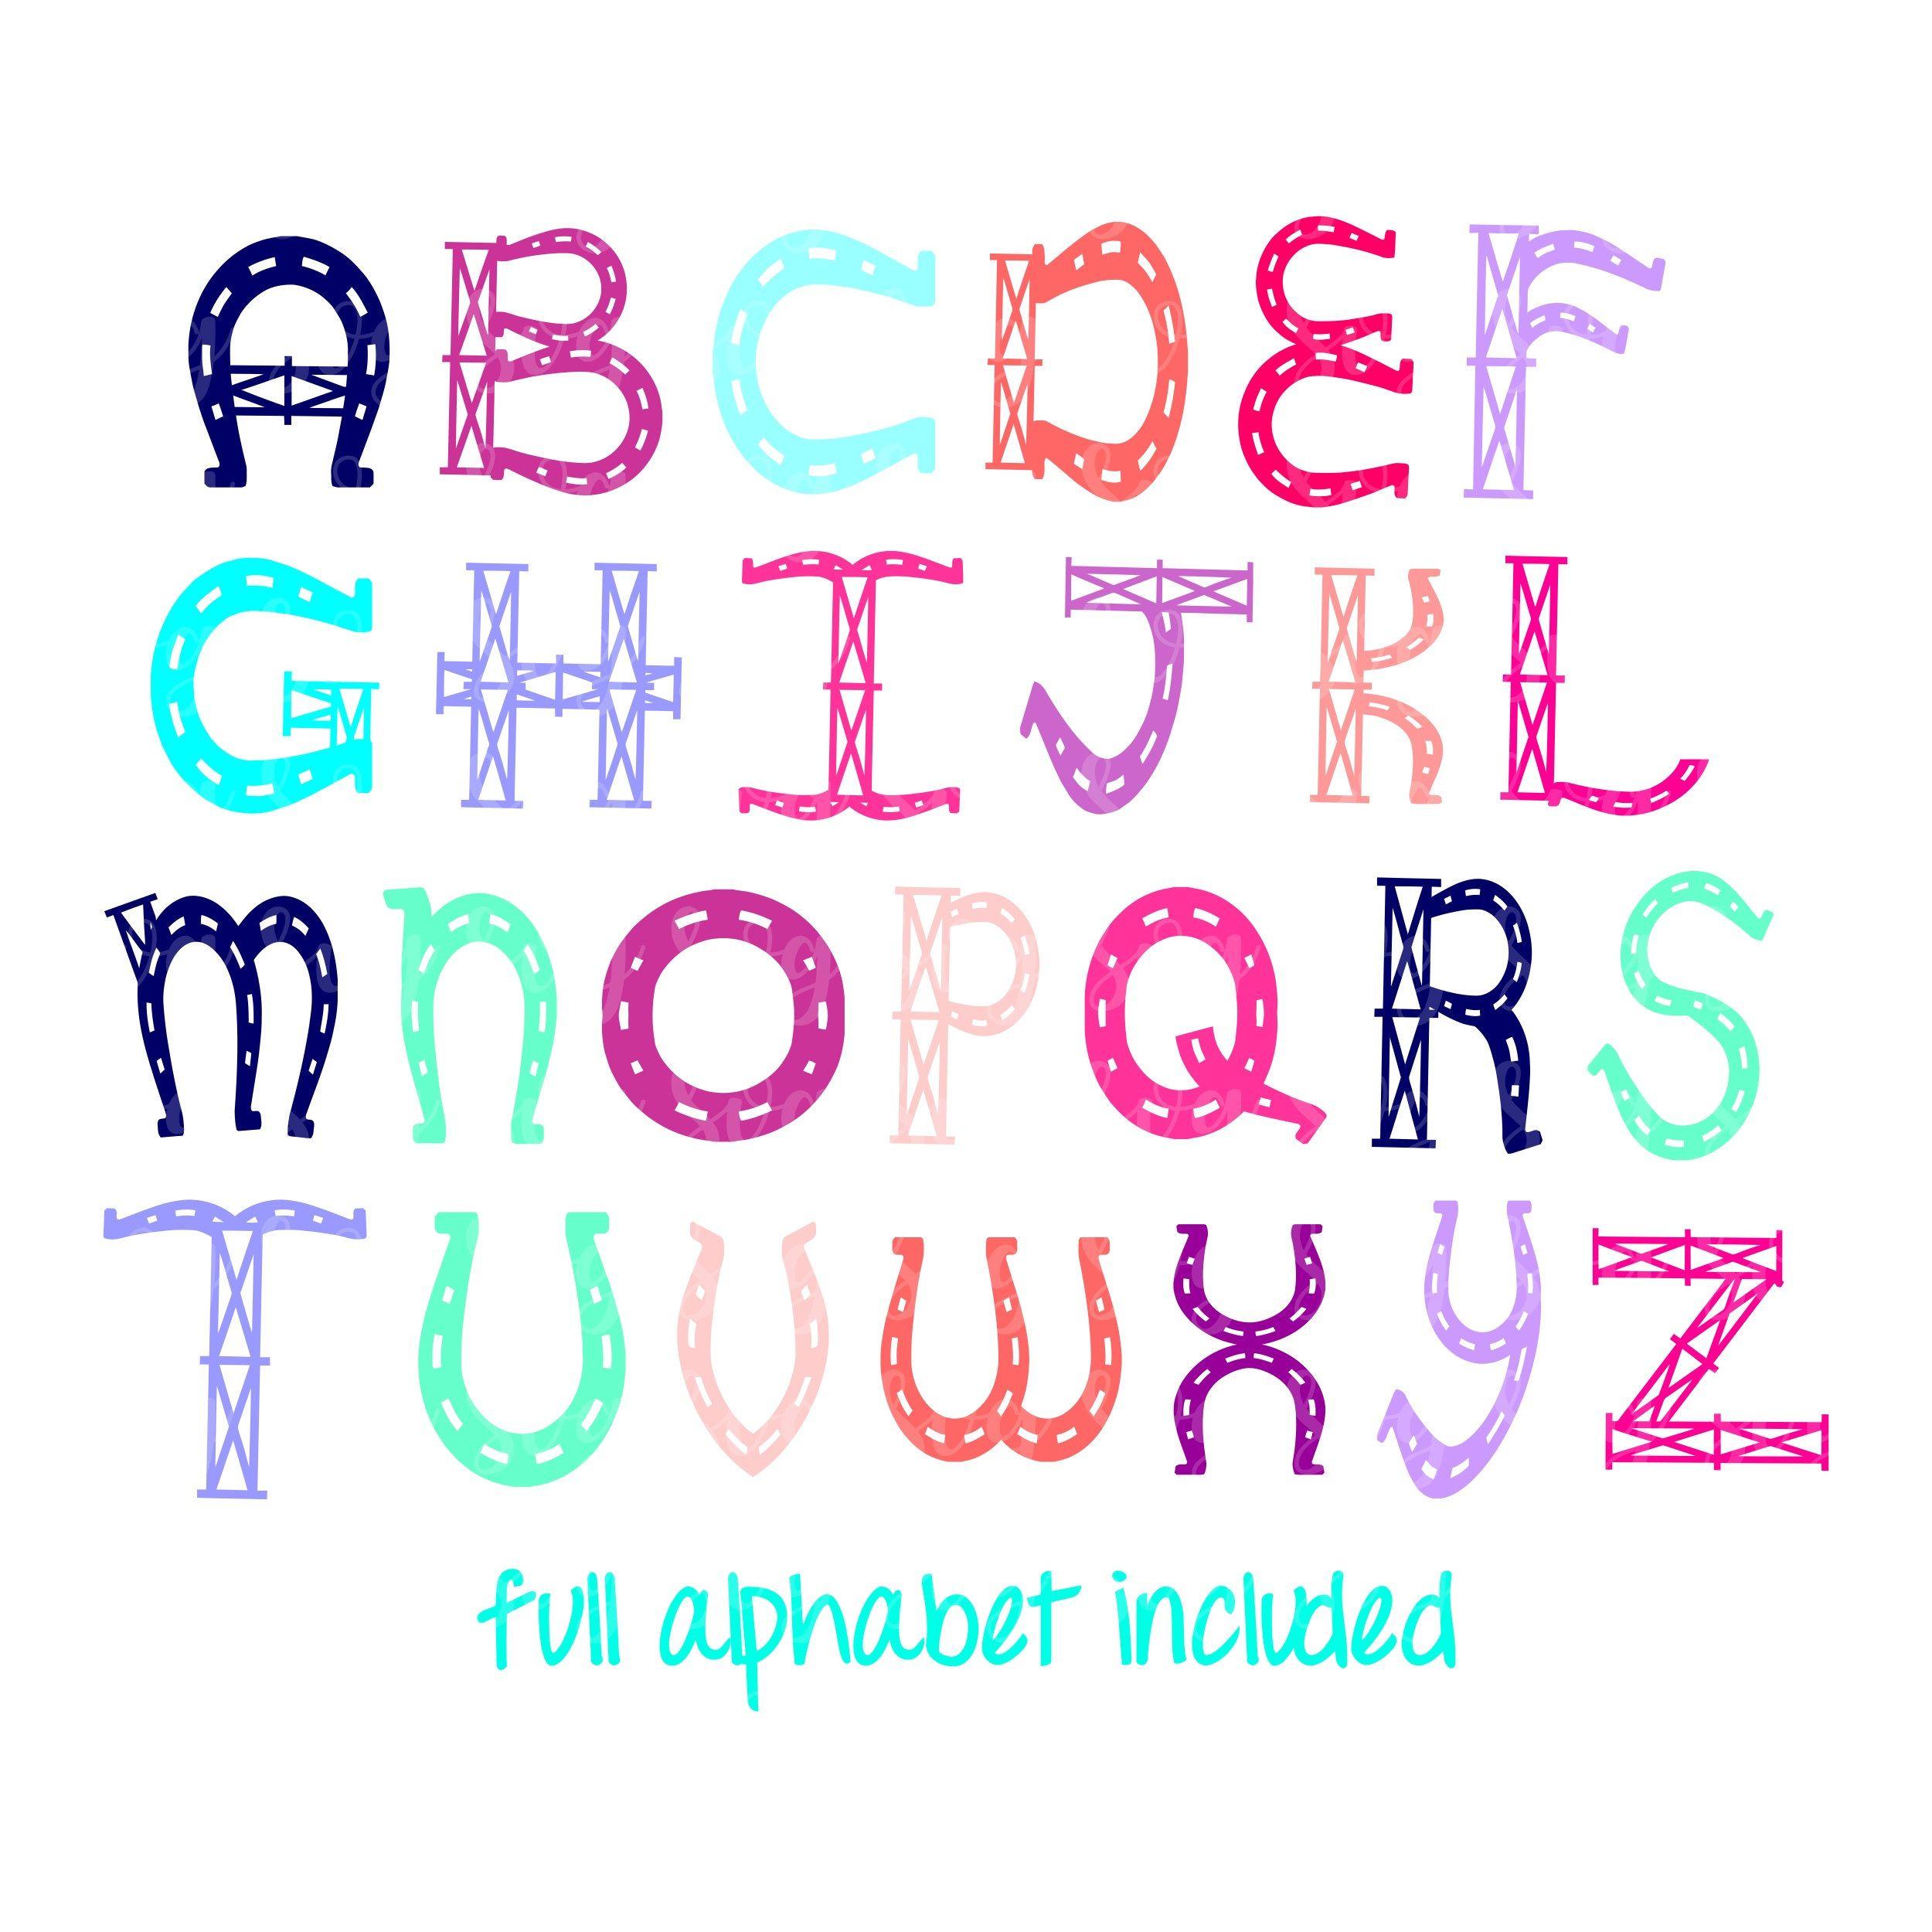 Instant Download Monogram font FARMHOUSE FONT dxf eps jpg png svg Rustic Farm house Letters Digital Cut File